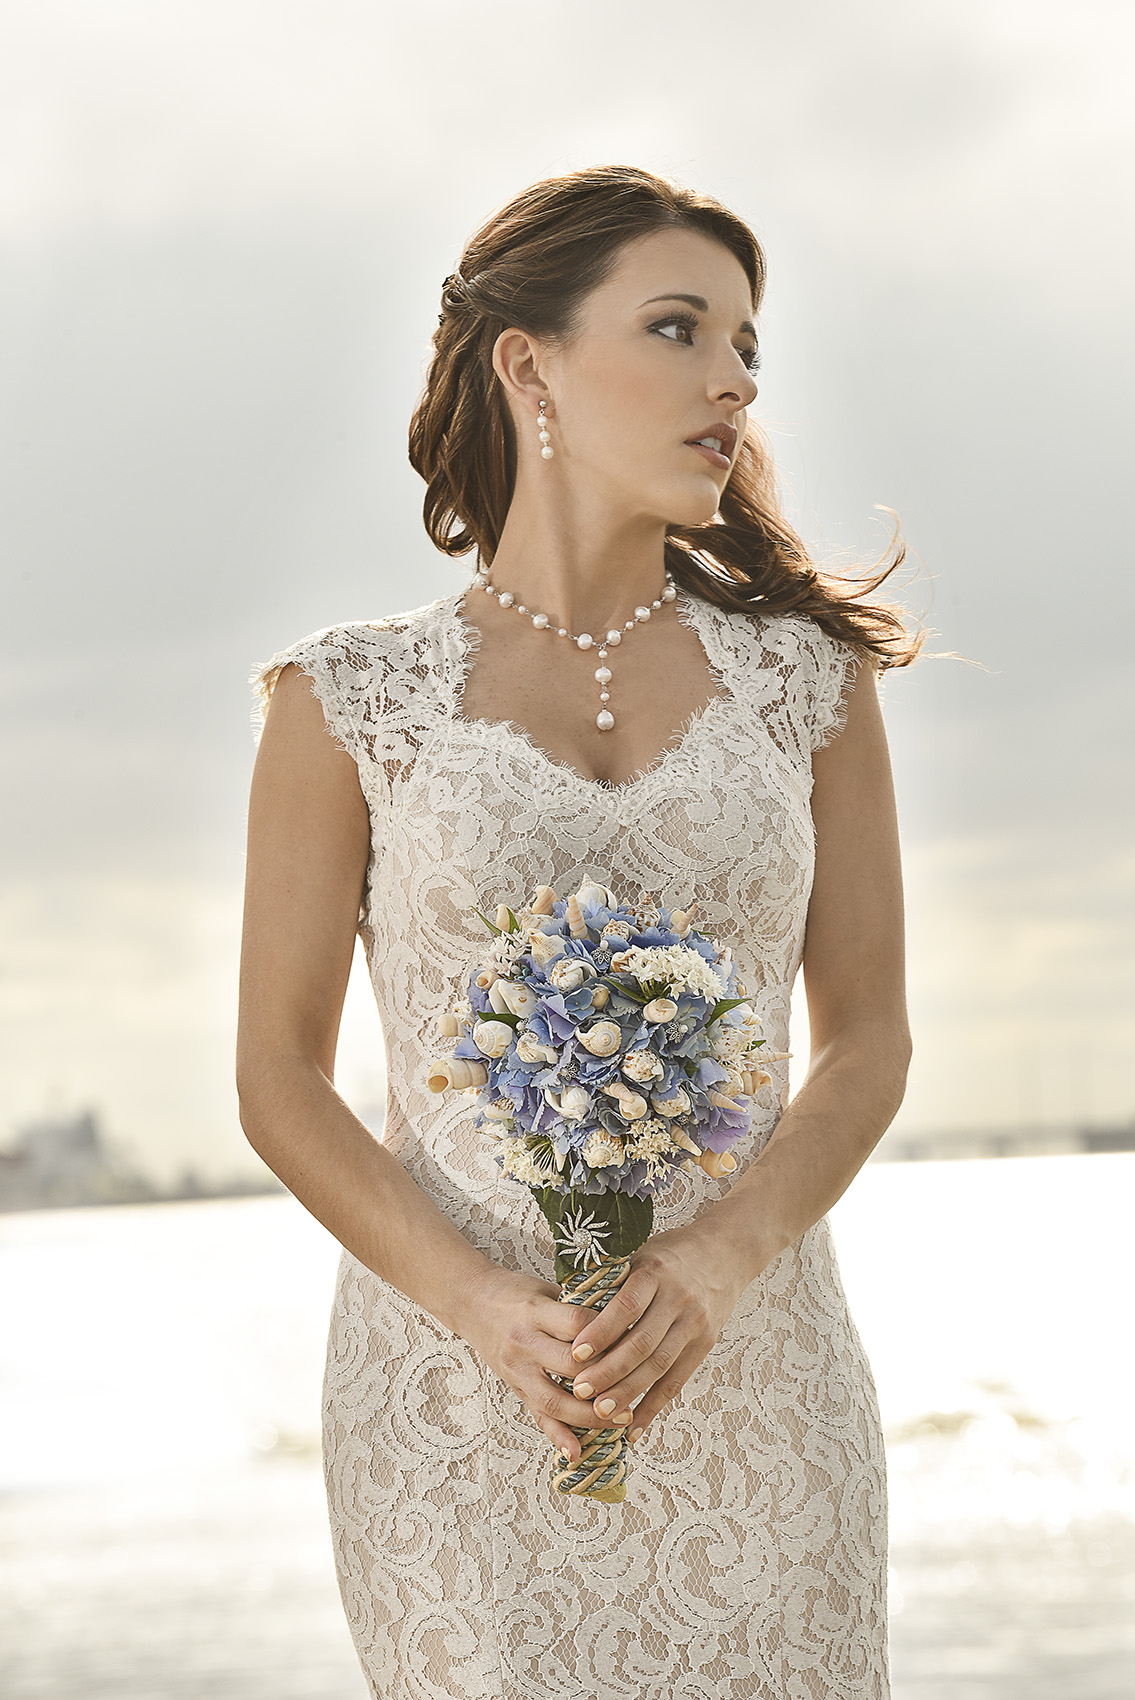 Galveston Modern Romantic Classy High Fashion Military Coastguard Wedding photography